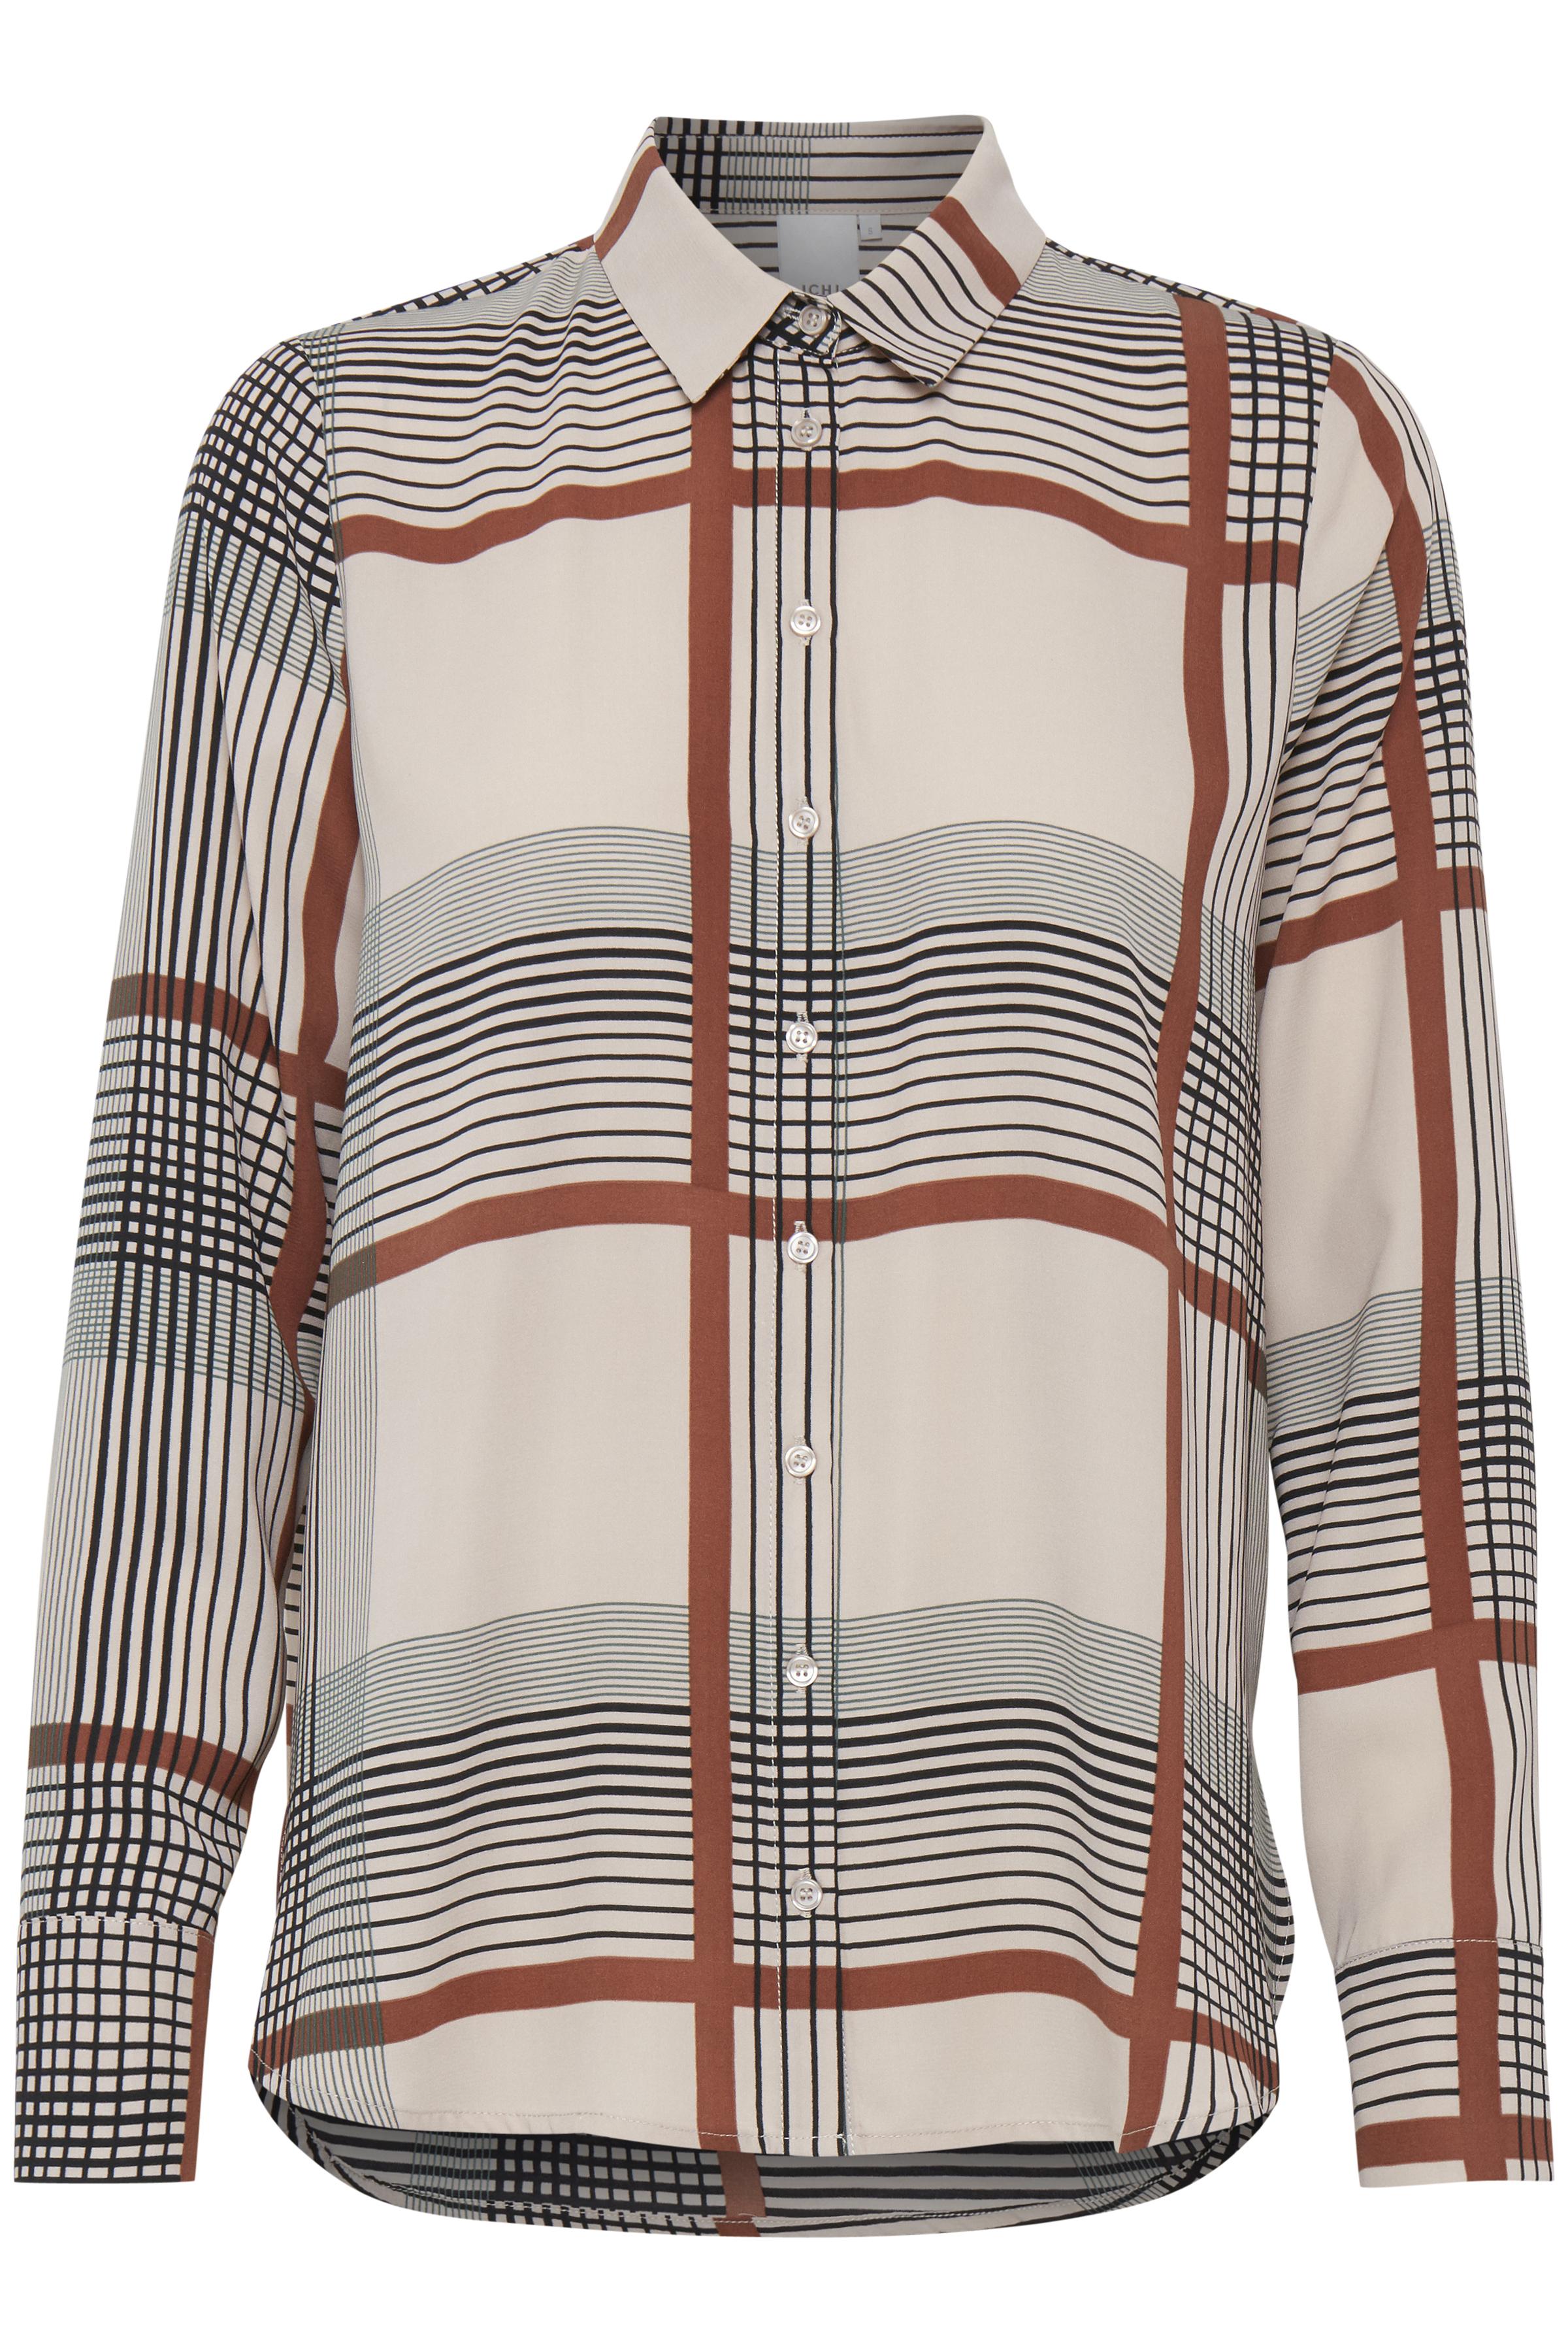 Chateau Gray Langærmet skjorte – Køb Chateau Gray Langærmet skjorte fra str. XS-L her